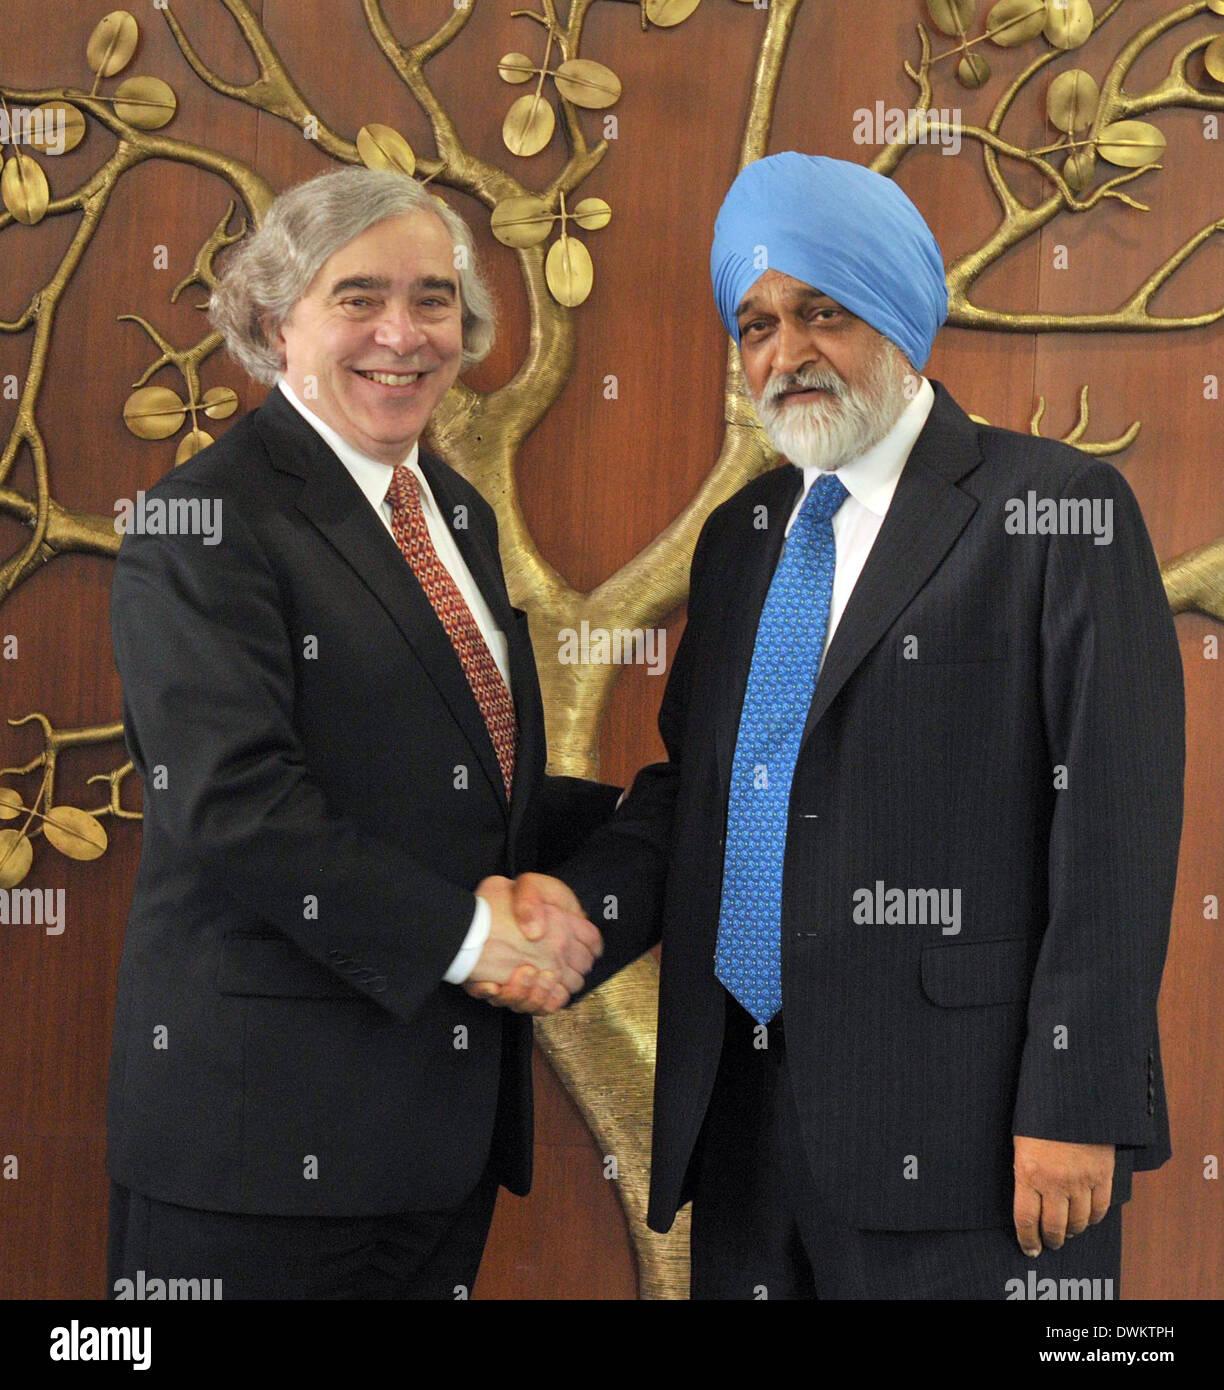 New Delhi, India. 11th Mar, 2014. U.S. Secretary of Energy Ernest J. Moniz (L) shakes hands with Montek Singh Ahluwalia, Stock Photo